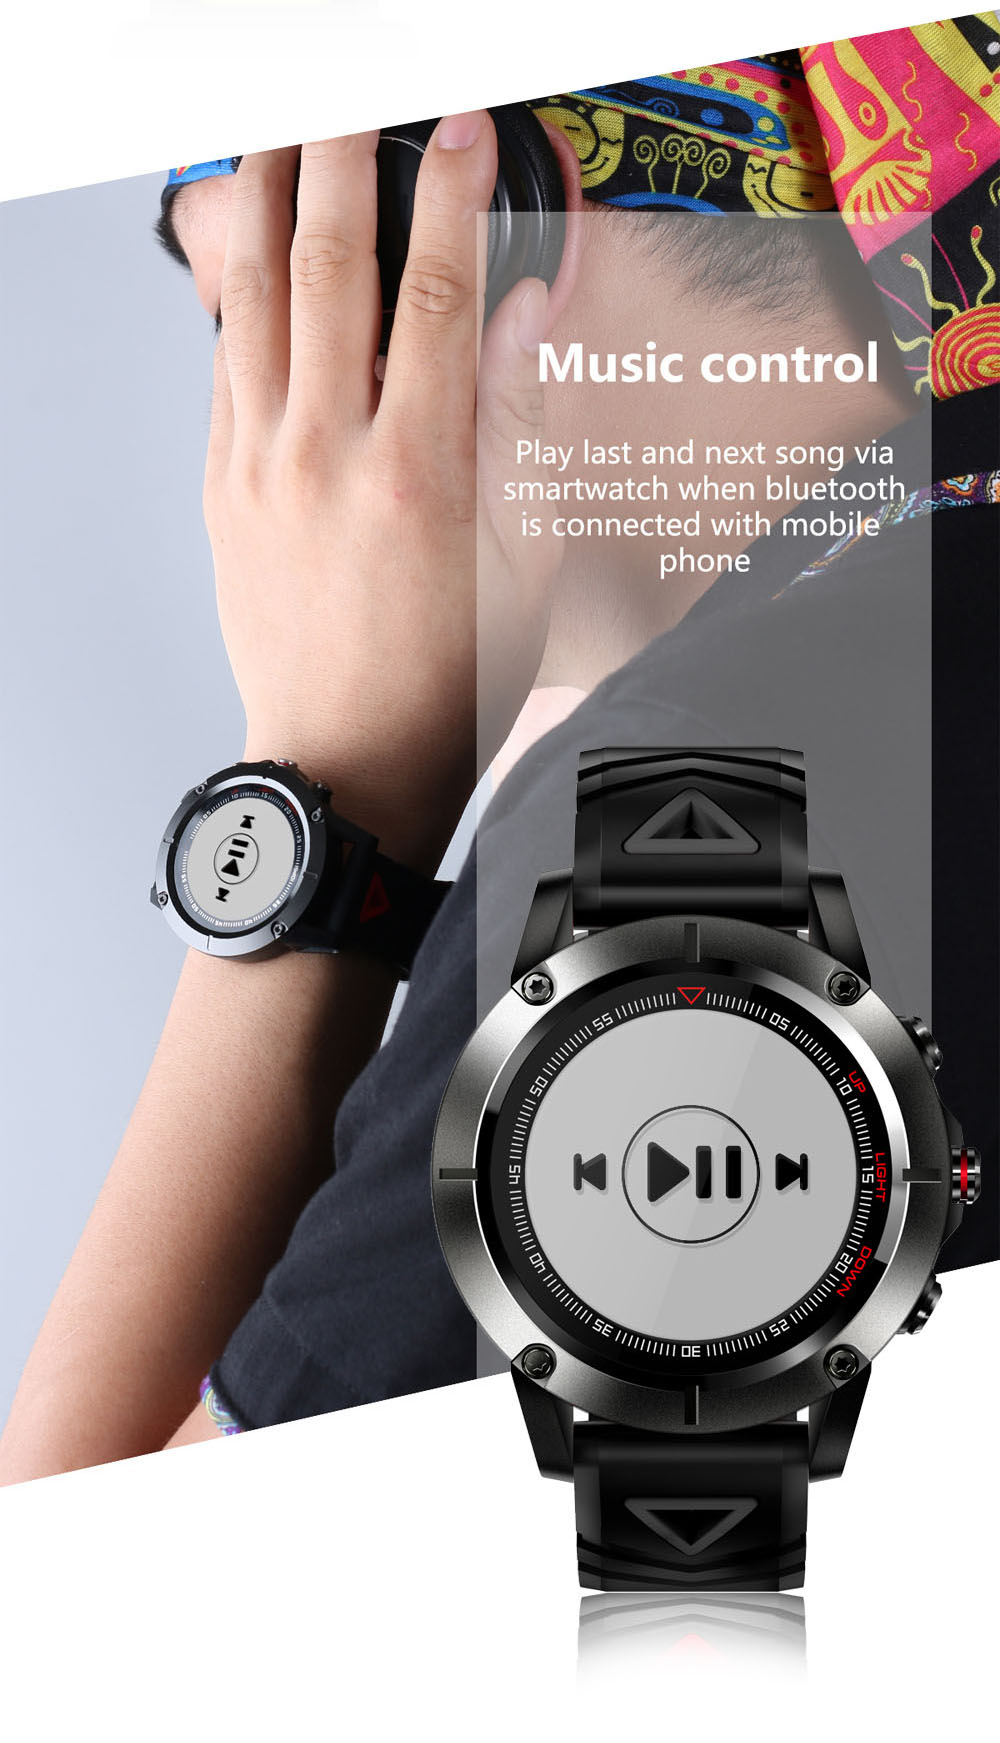 g01 gps watch